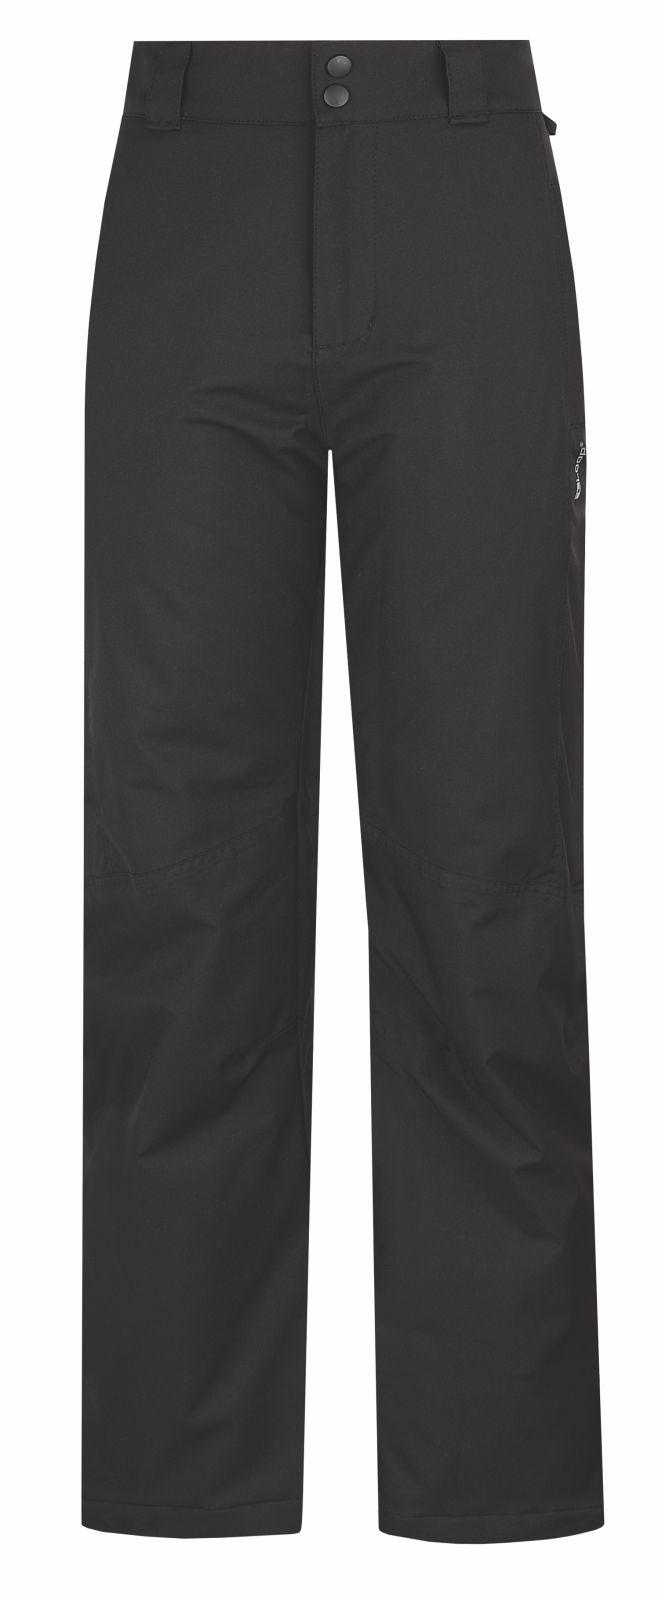 LOAP Dámské lyžařské kalhoty FLORELA velikost XS-XXL